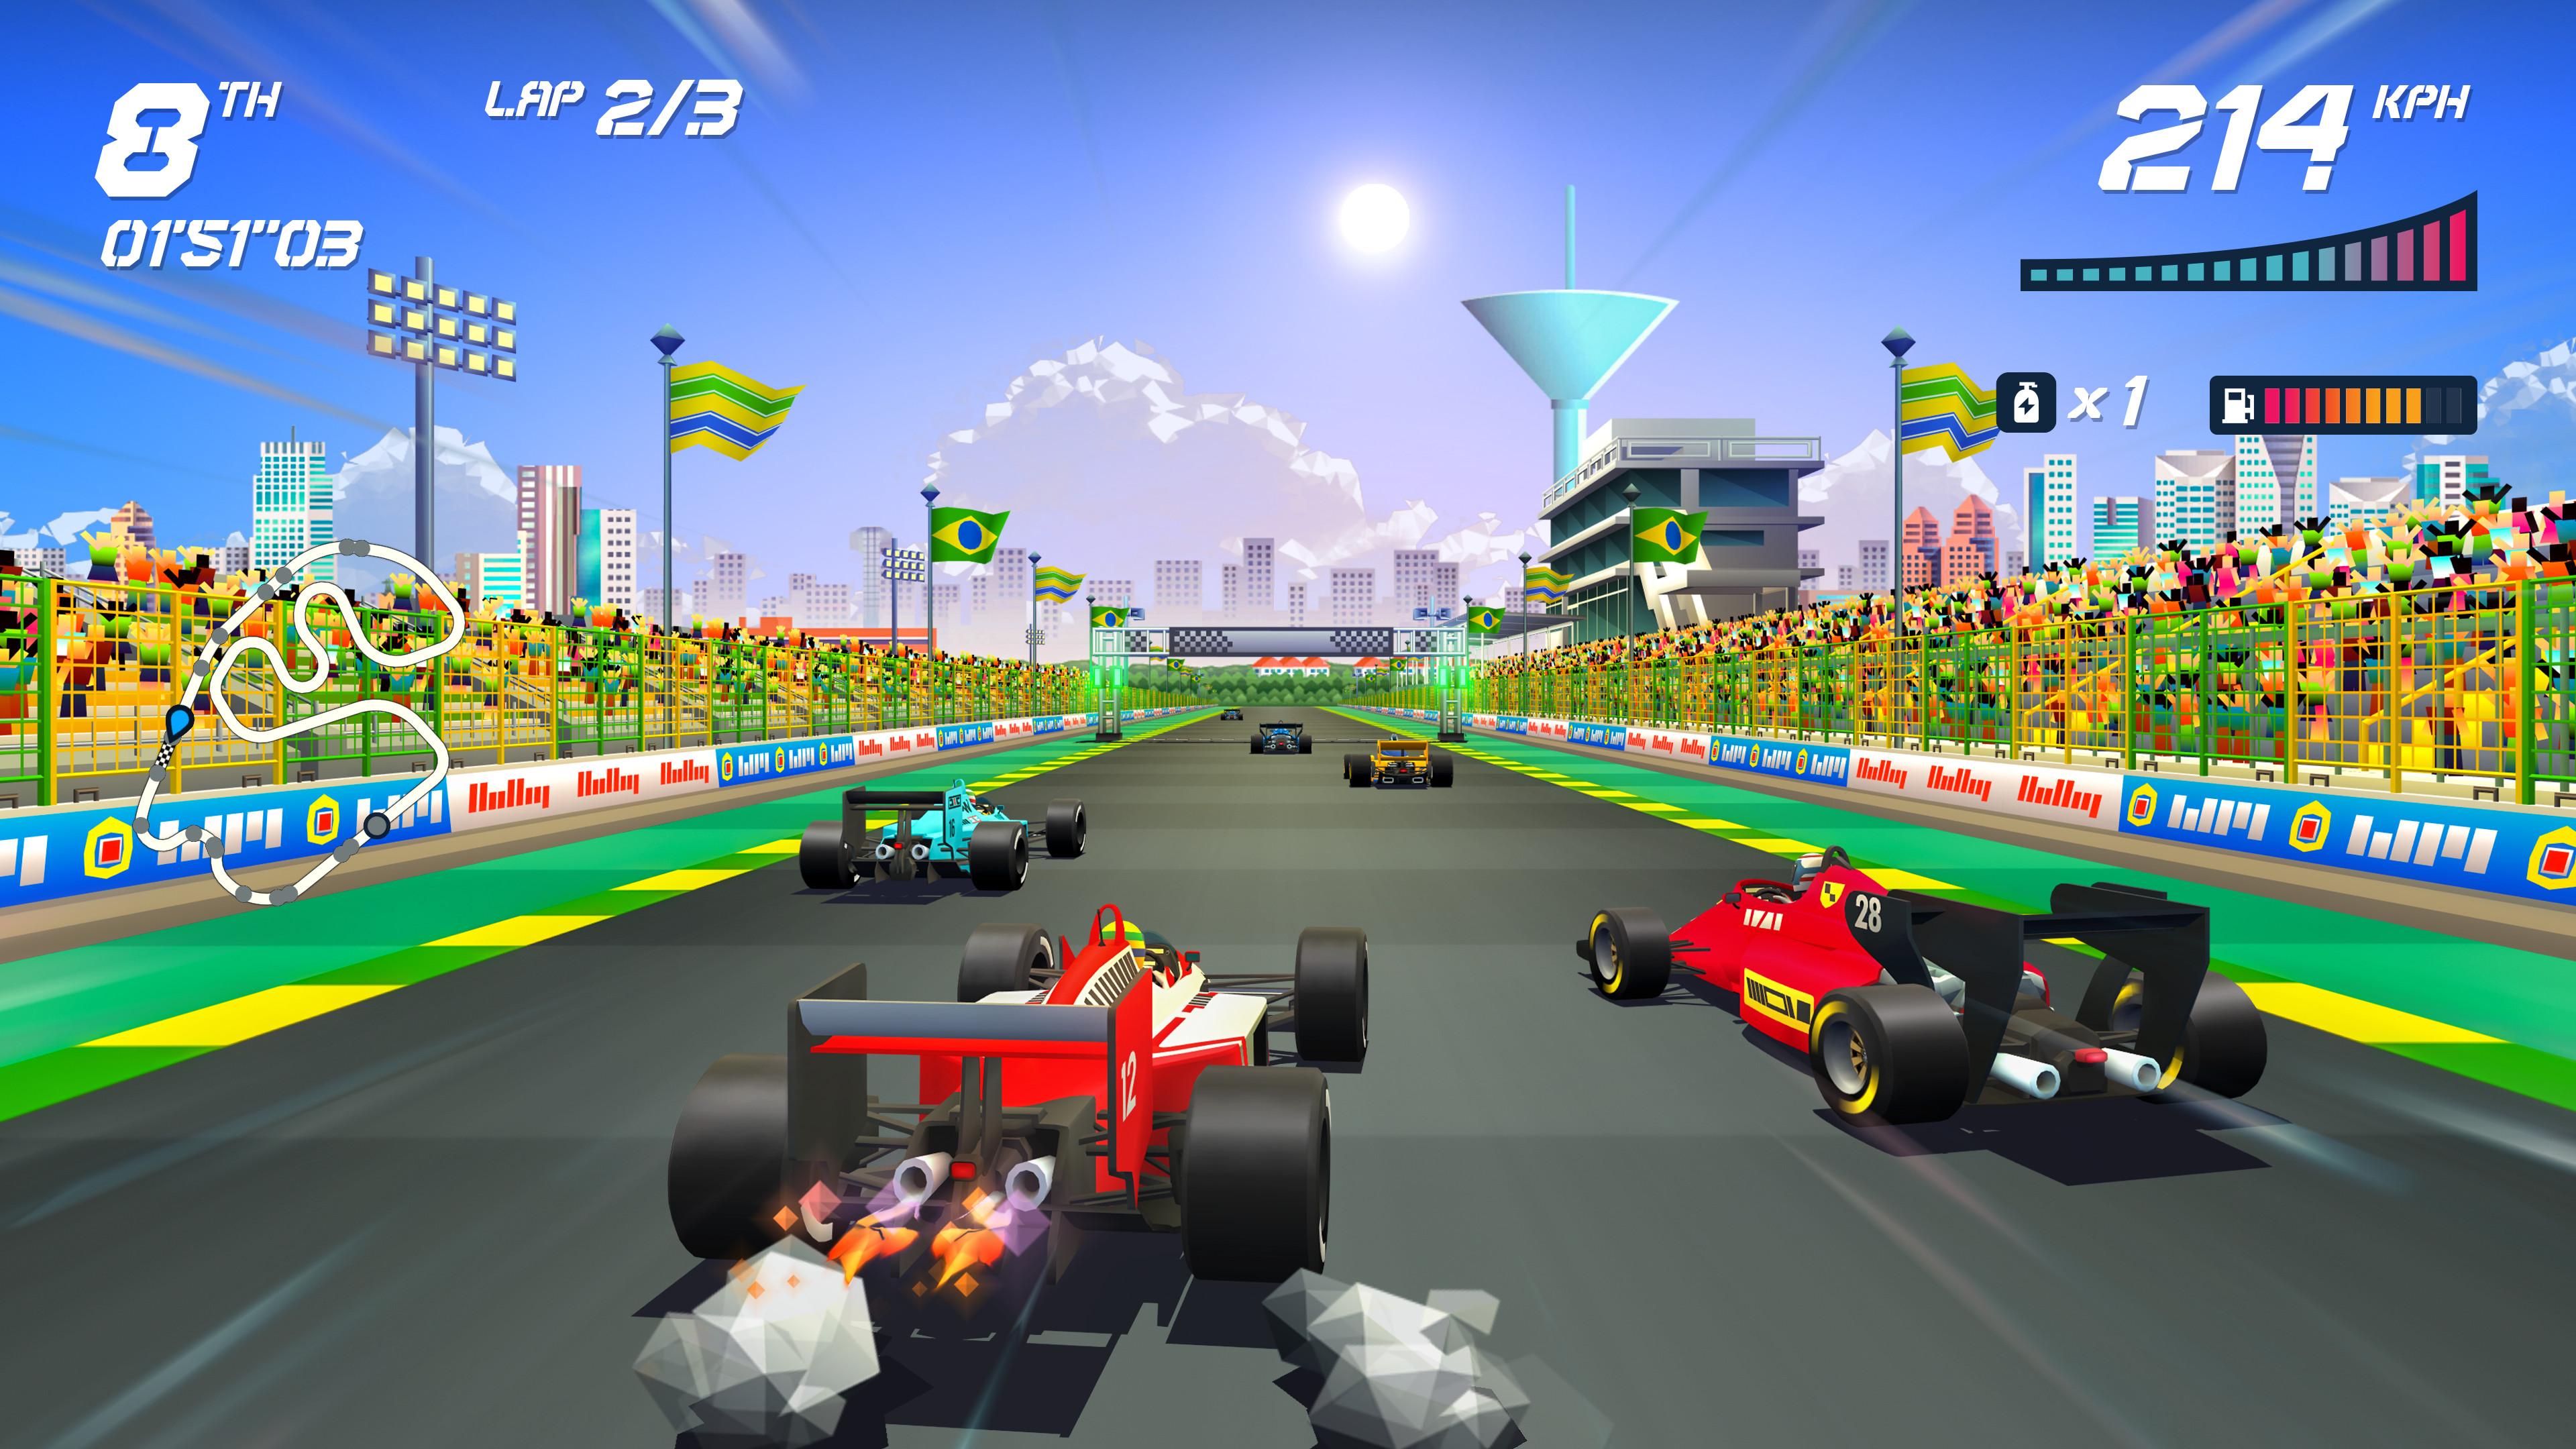 Horizon Chase Senna Forever Pic 4